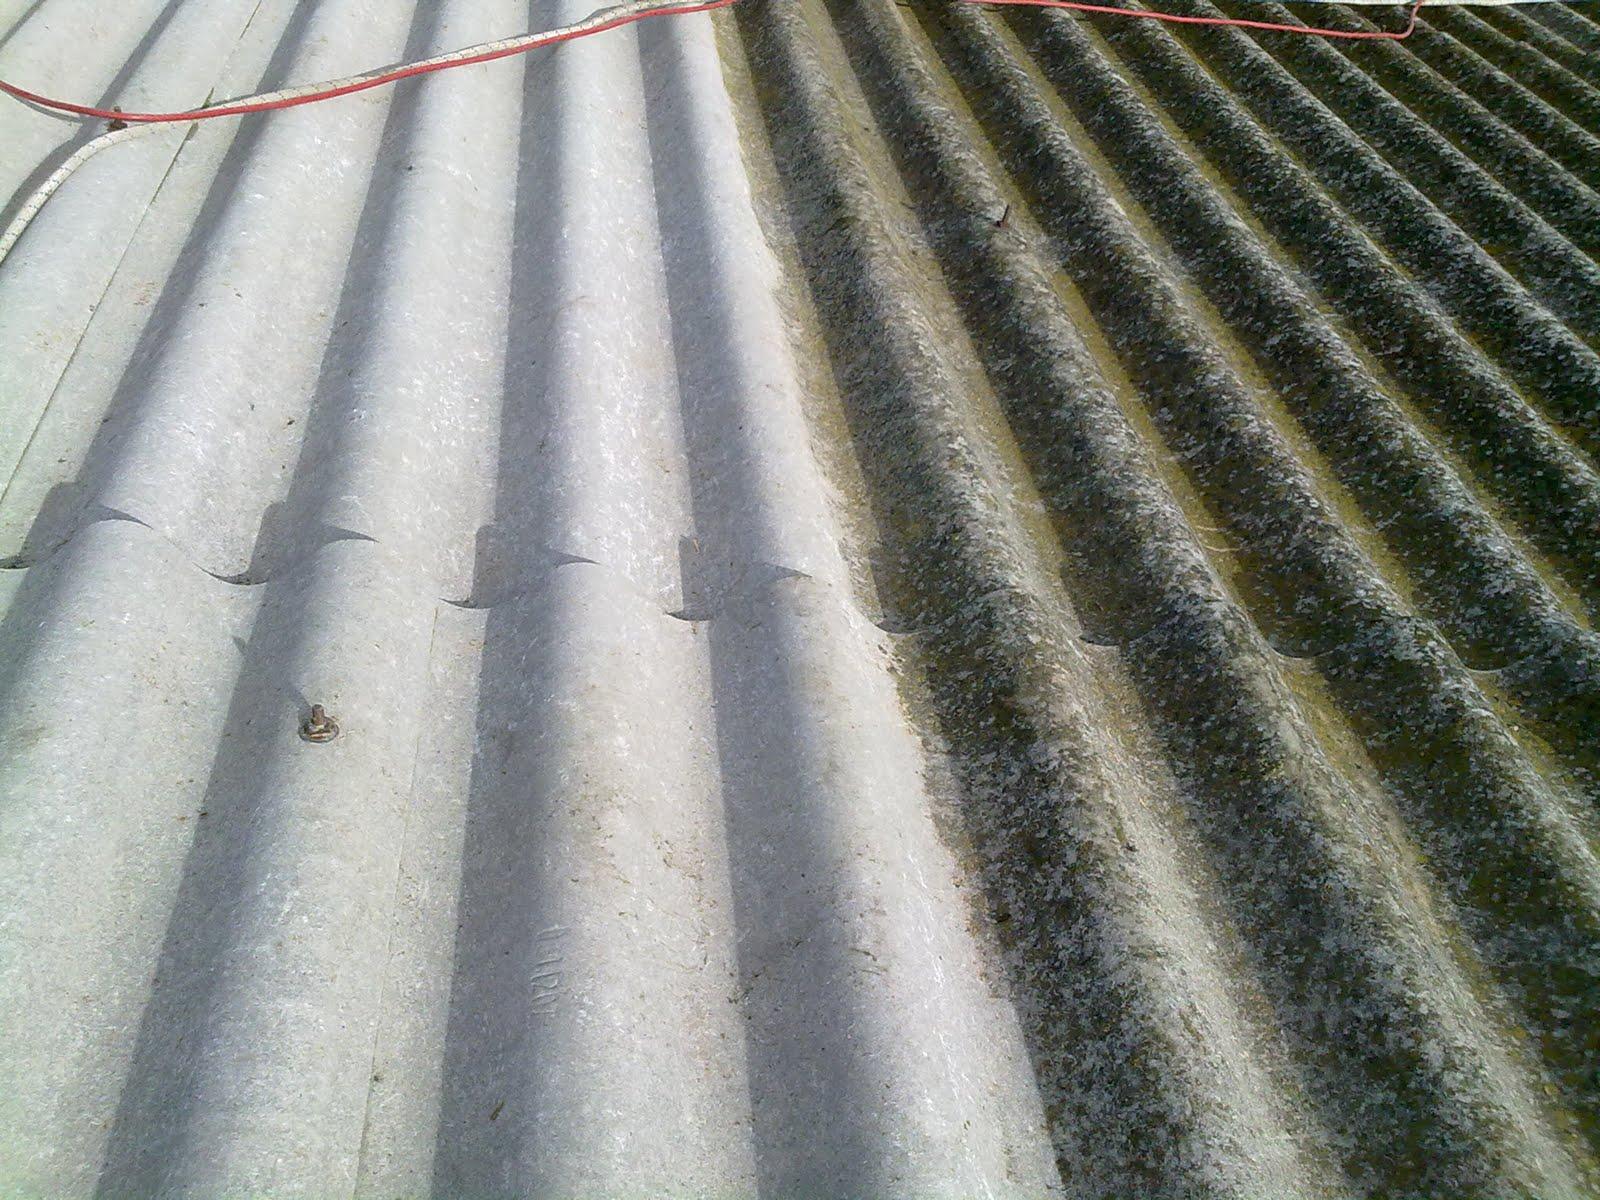 Reparar uralita reparar techo de uralita limpiar placas - Placas de fibrocemento ...